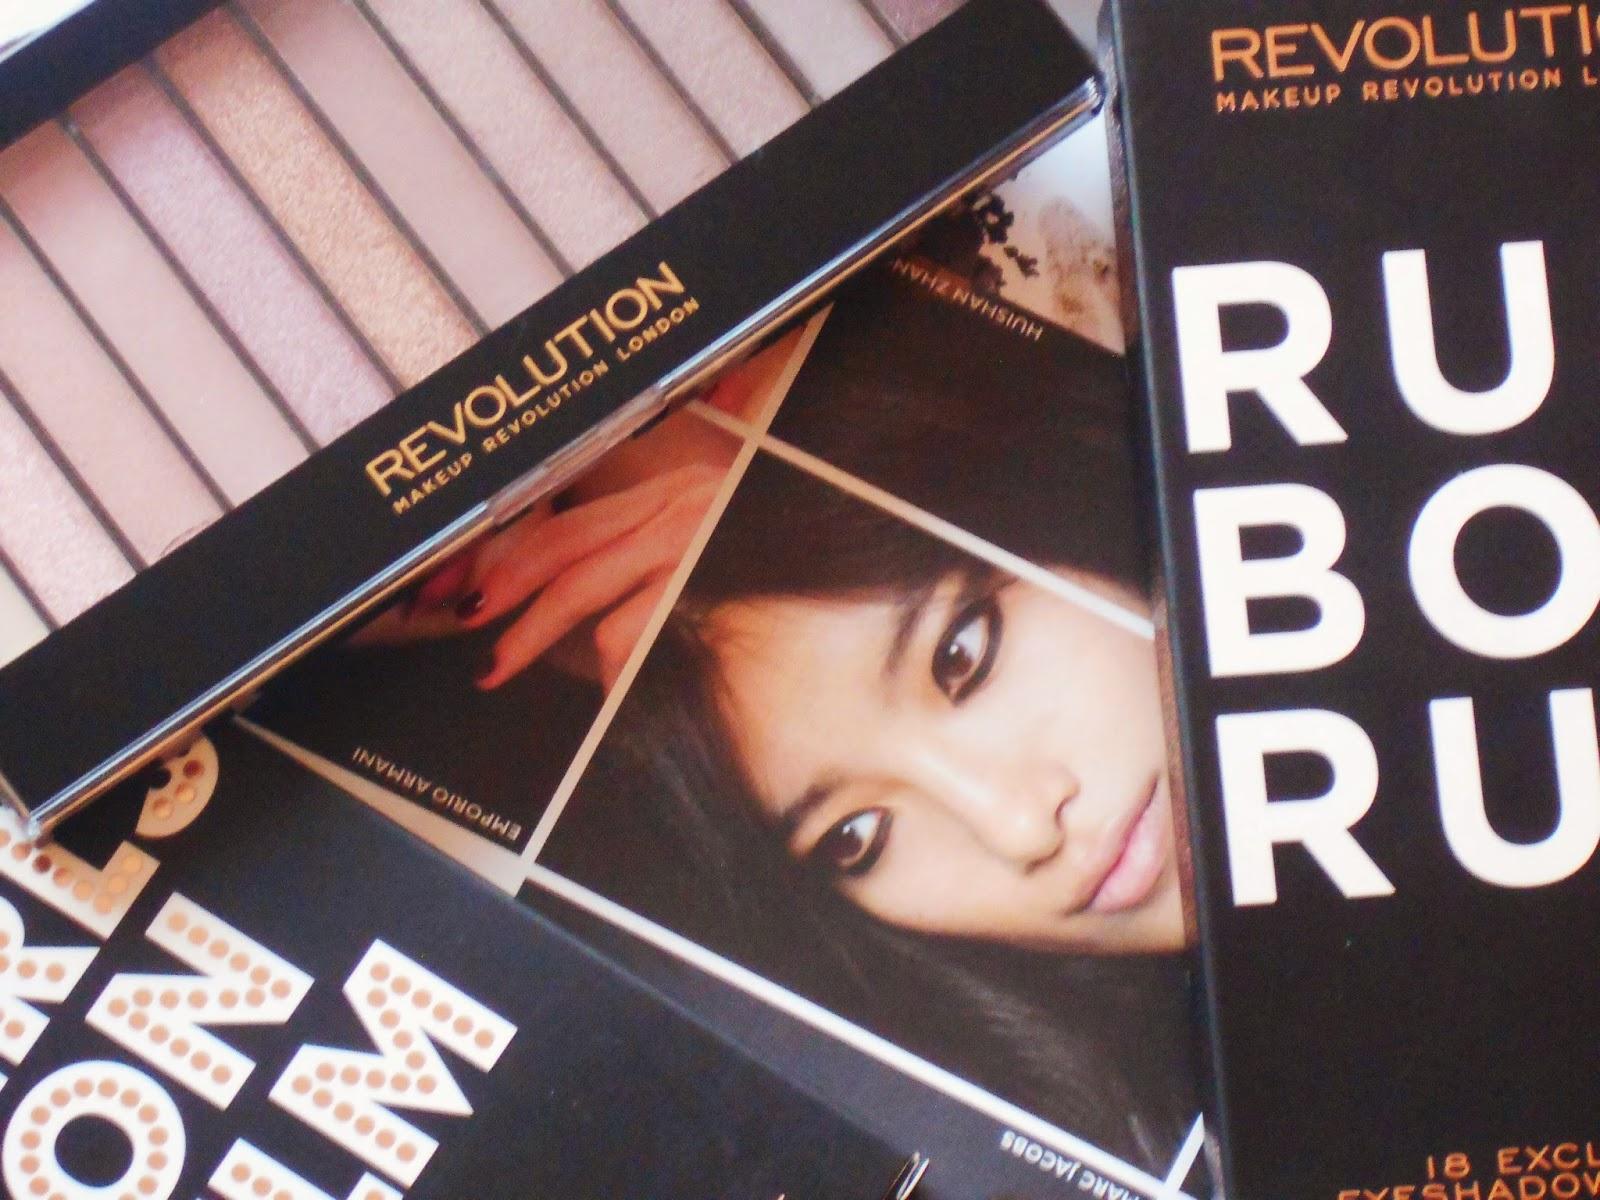 A Makeup Revolution?